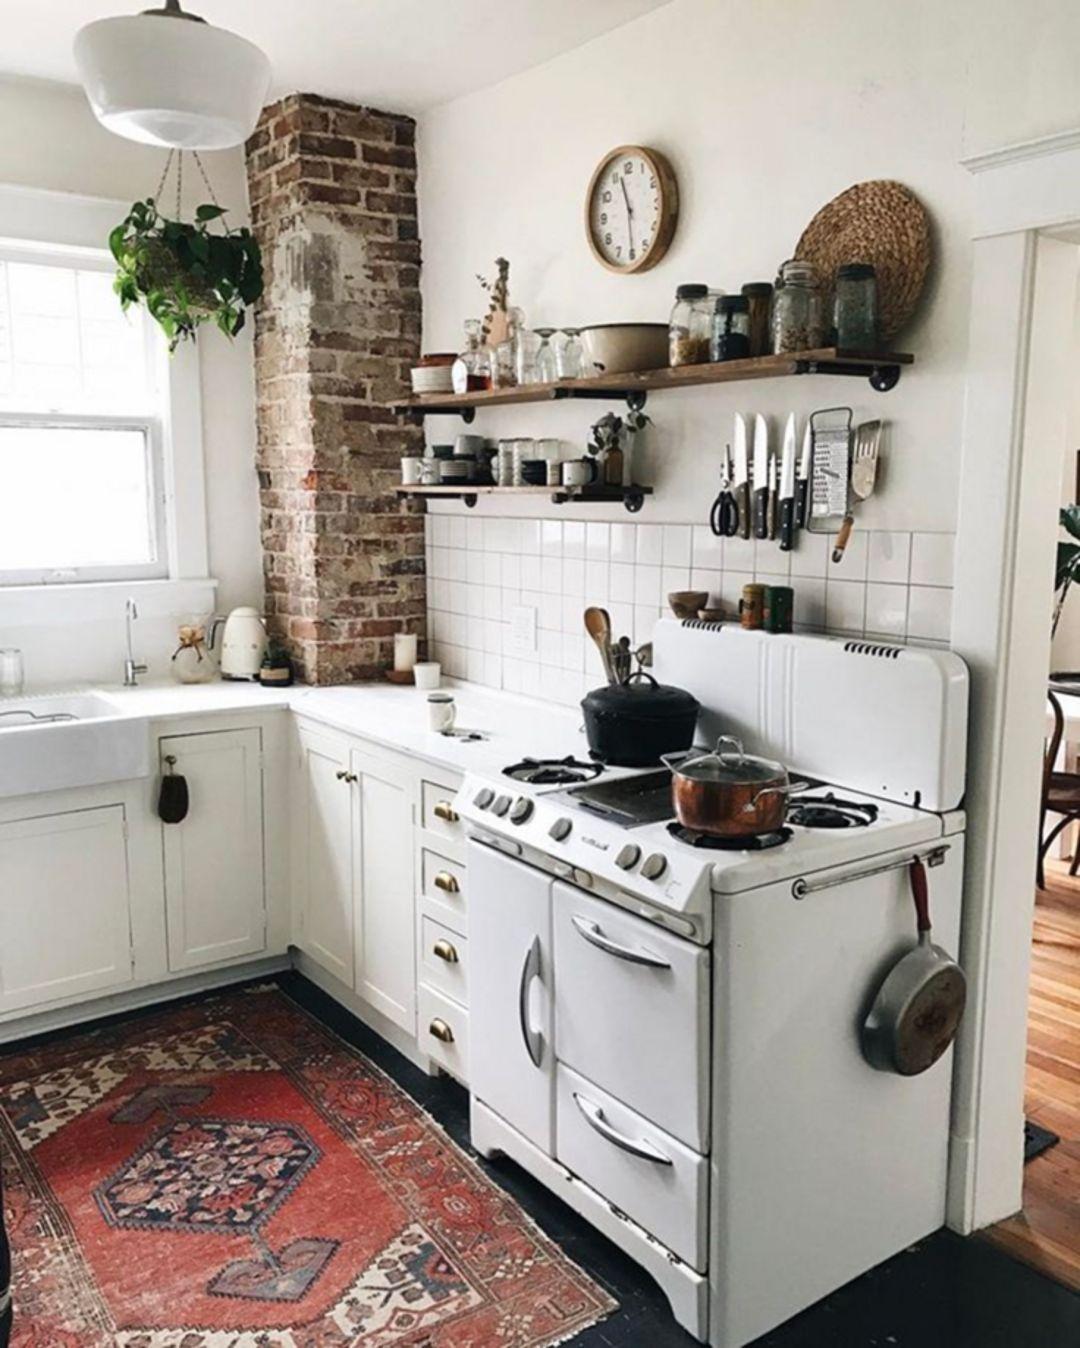 Interesting 9+ Minimalist Kitchen Self Design Ideas To Make Your ...